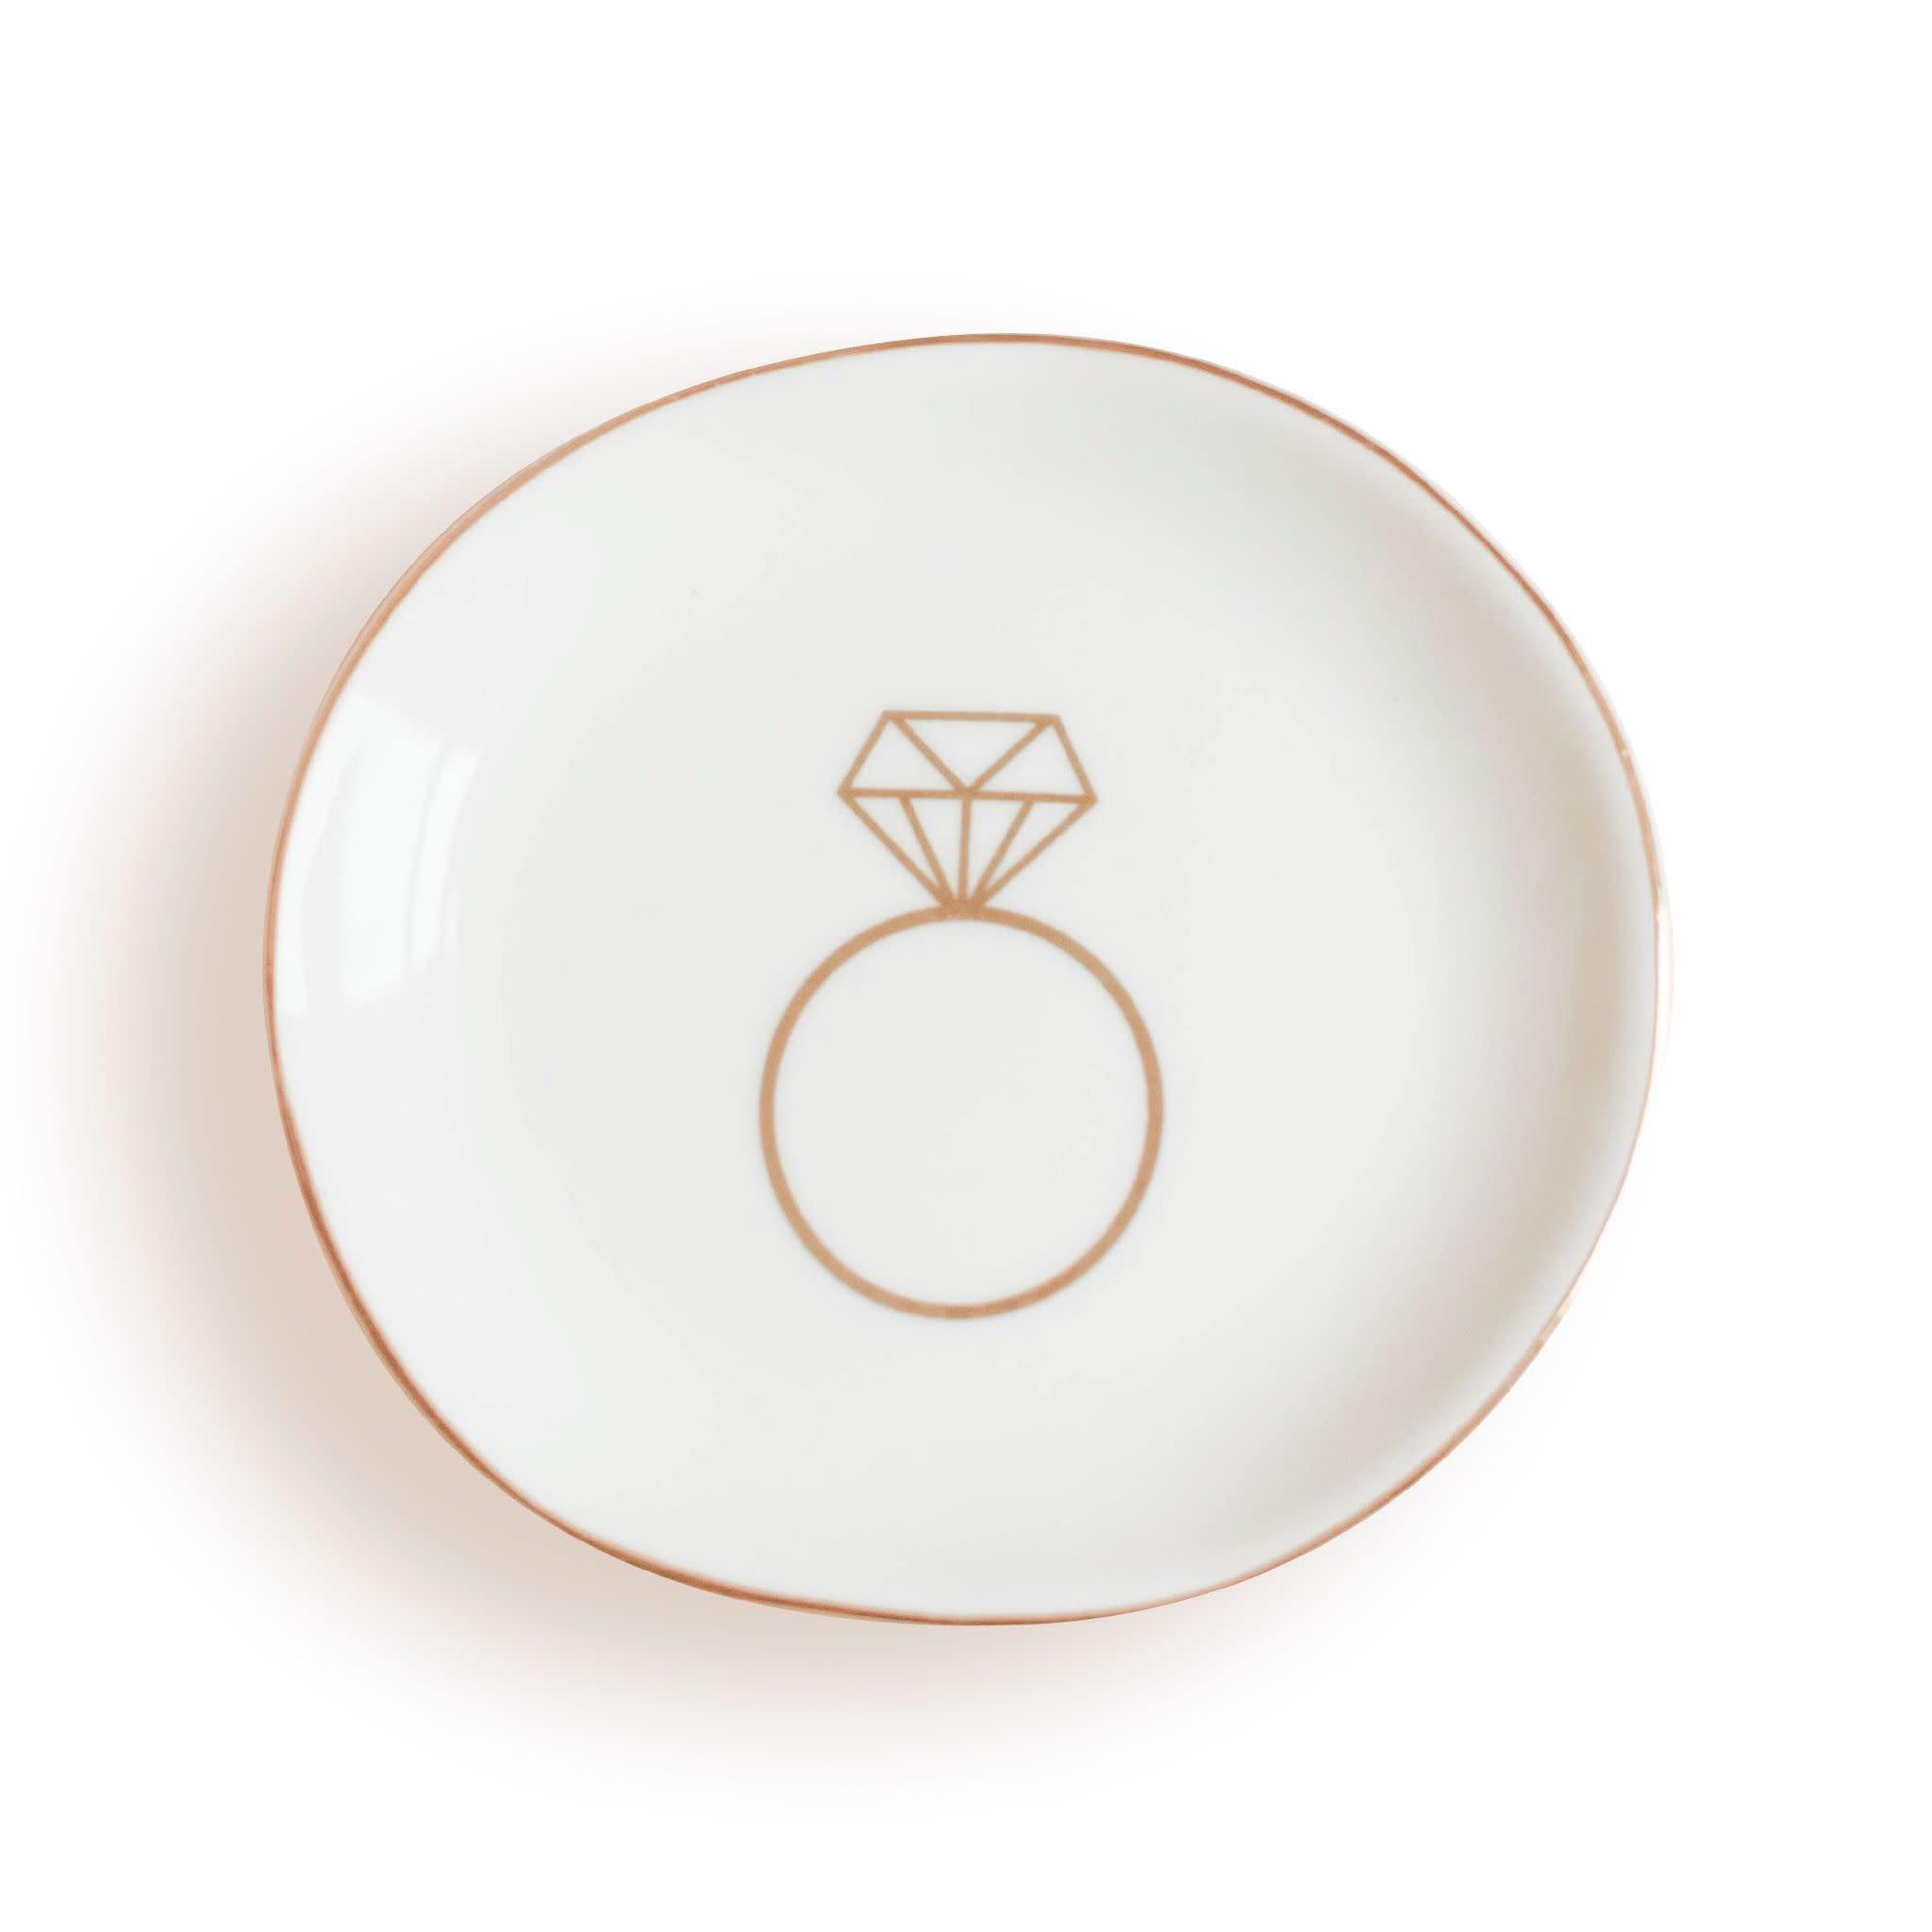 Ring Jewelry Dish